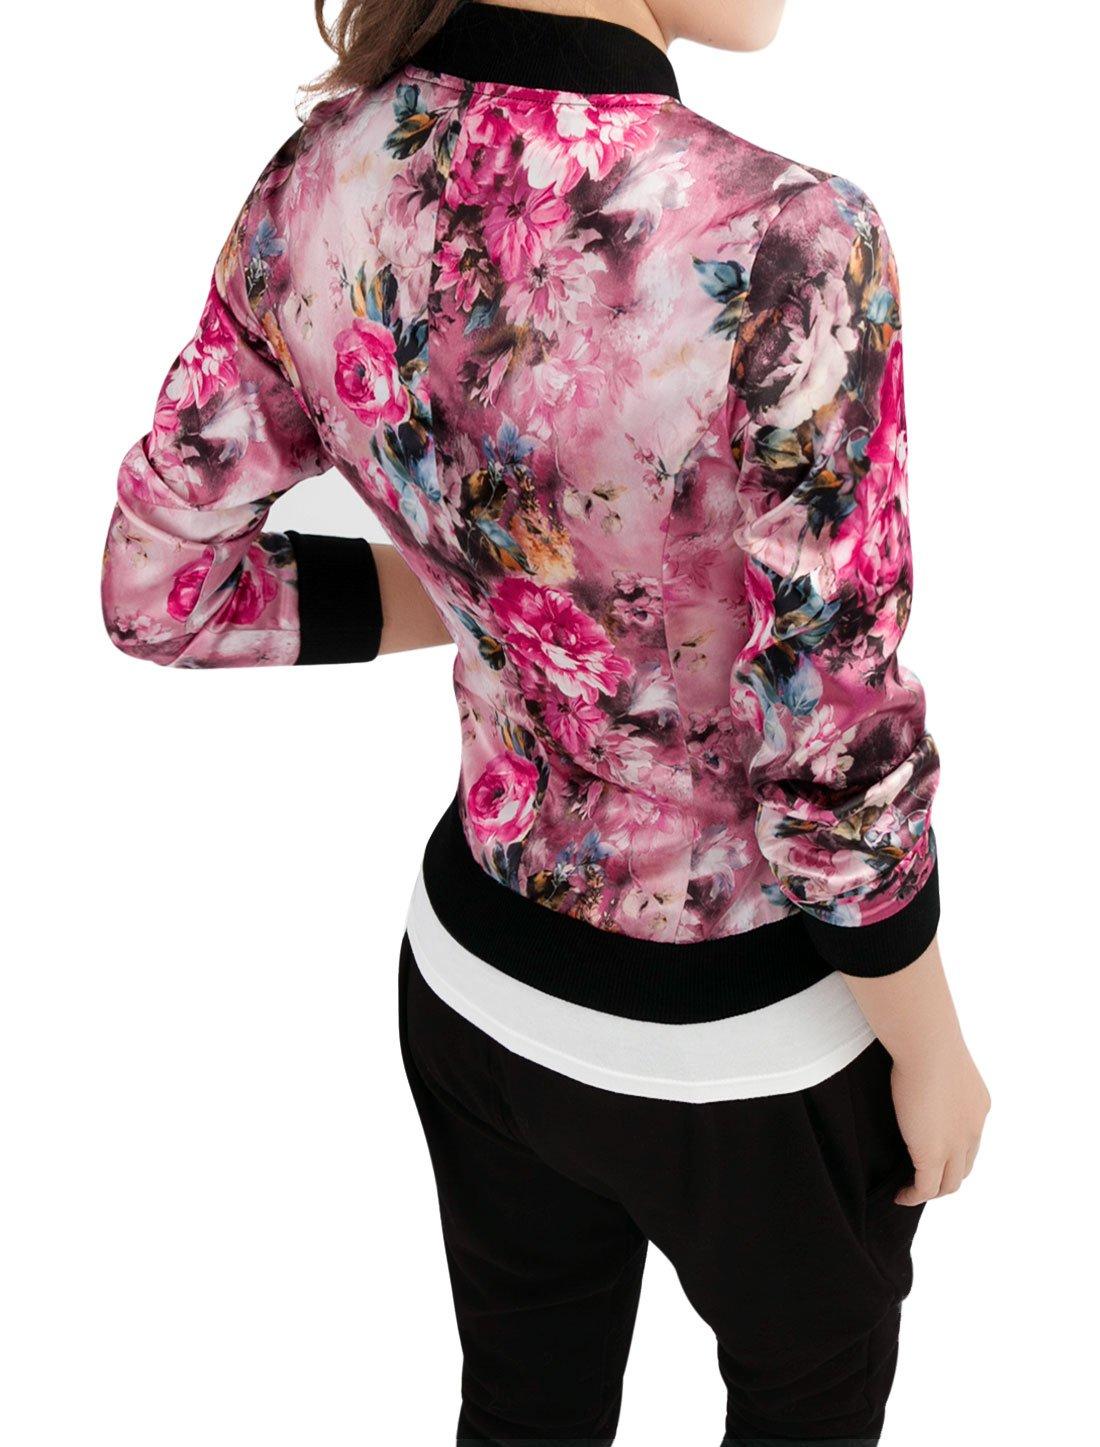 Allegra K Women's Long Sleeve Zip up Floral Print Casual Bomber Jacket Fuchsia S by Allegra K (Image #3)